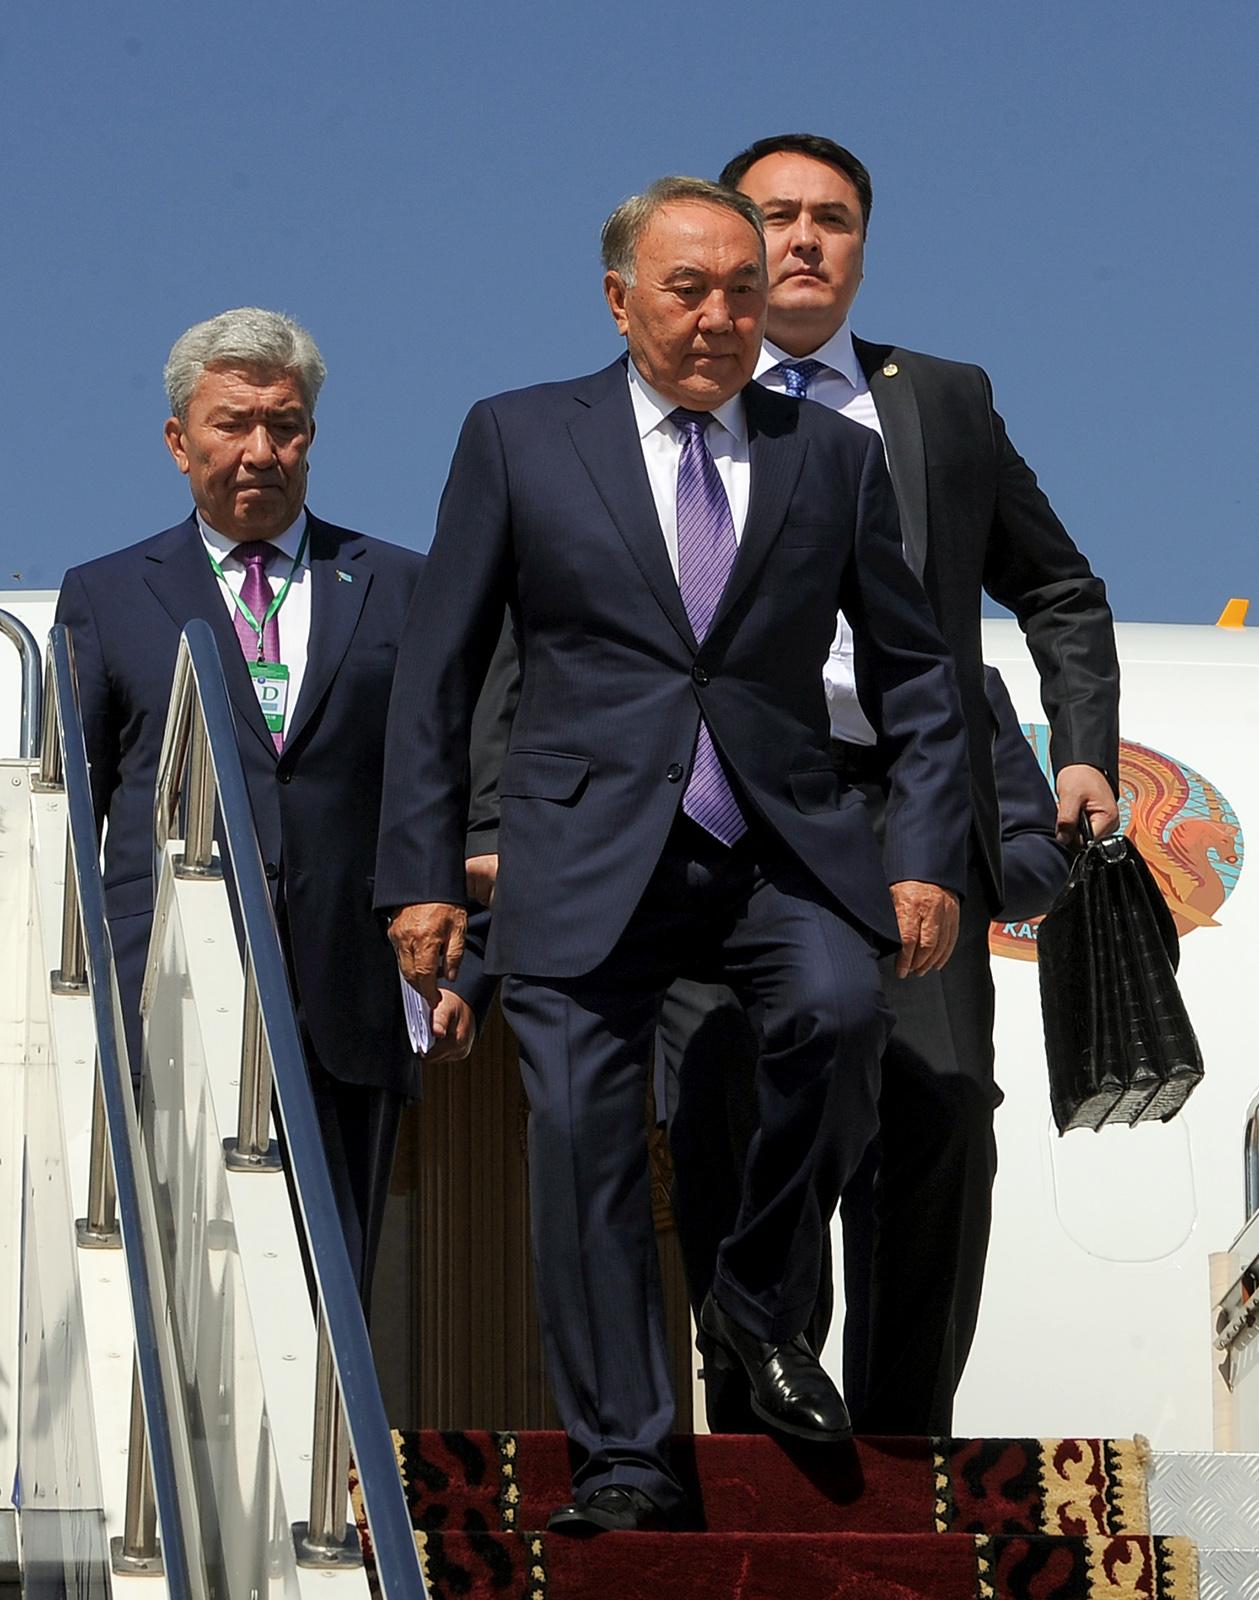 Президент Таджикистана Эмомали Рахмон прибыл вБишкек